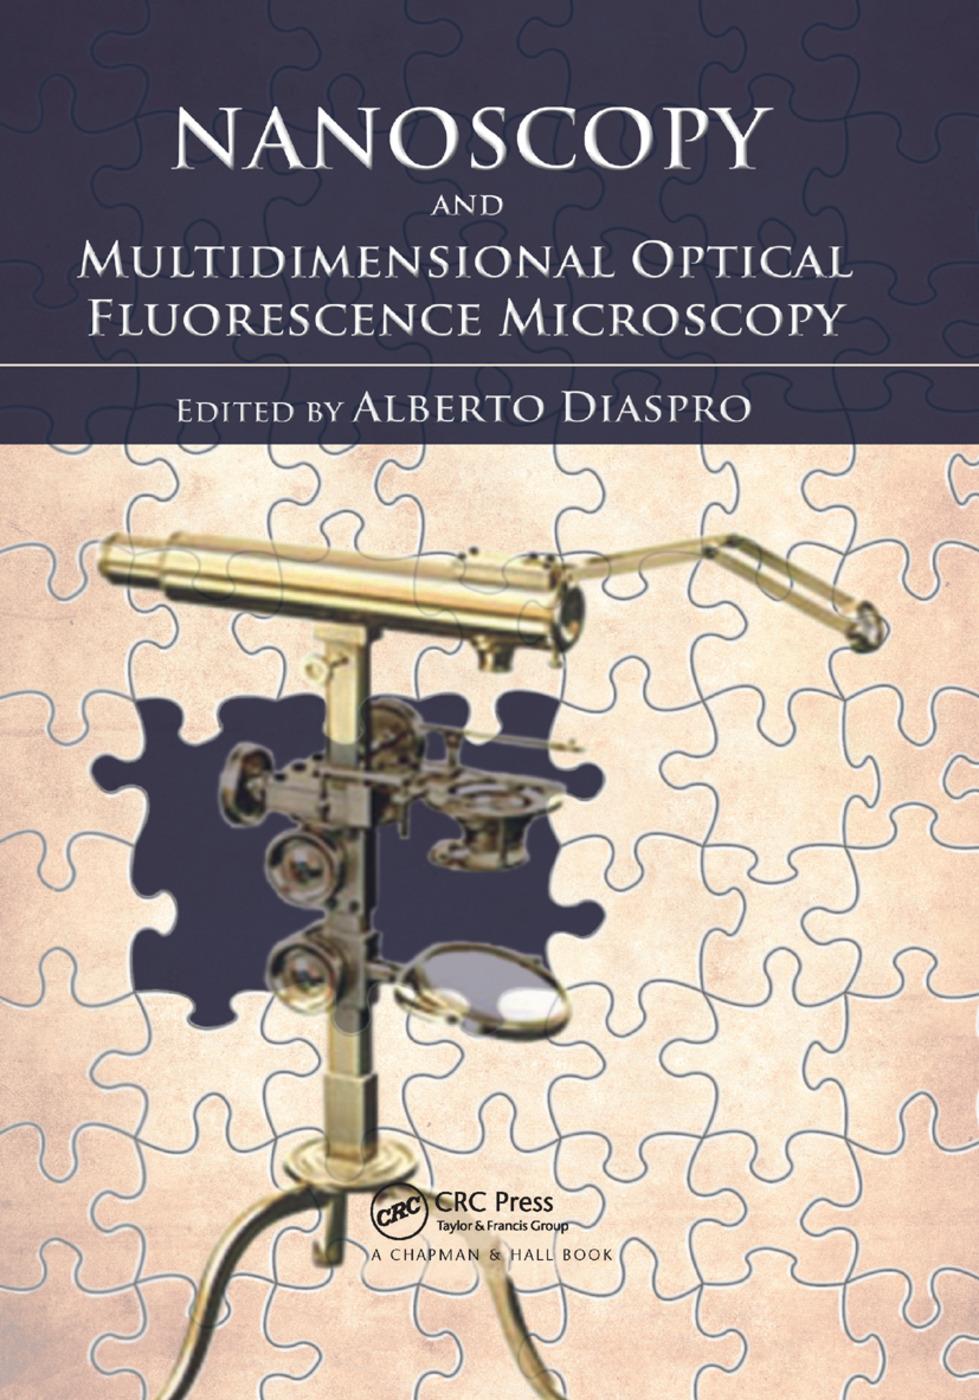 Nanoscopy and Multidimensional Optical Fluorescence Microscopy: 1st Edition (Paperback) book cover